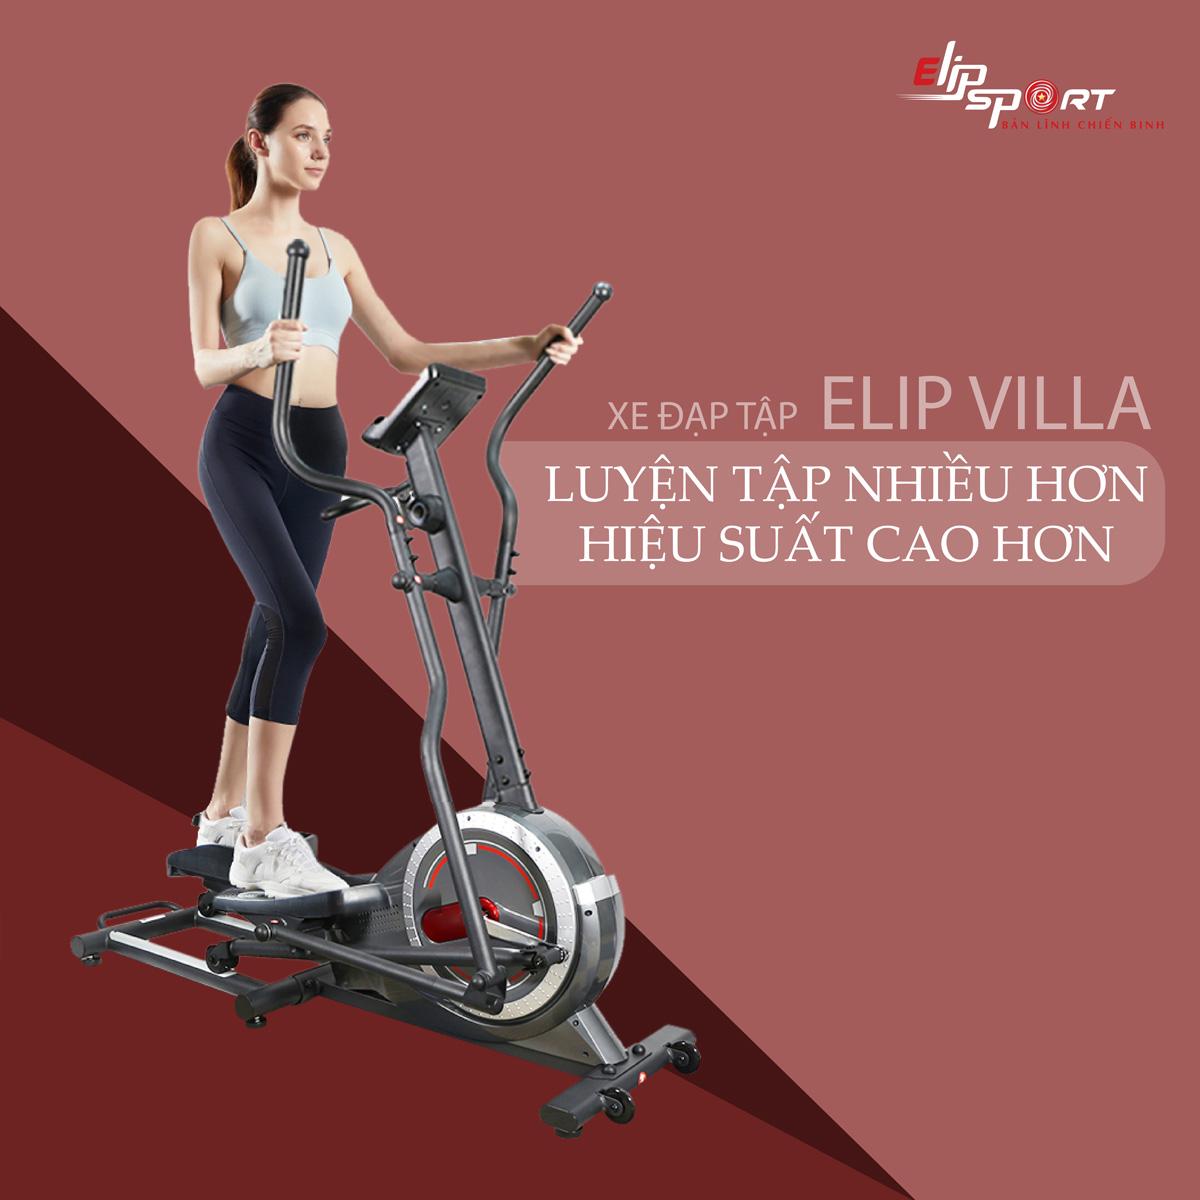 Xe đạp tập ELIP Villa